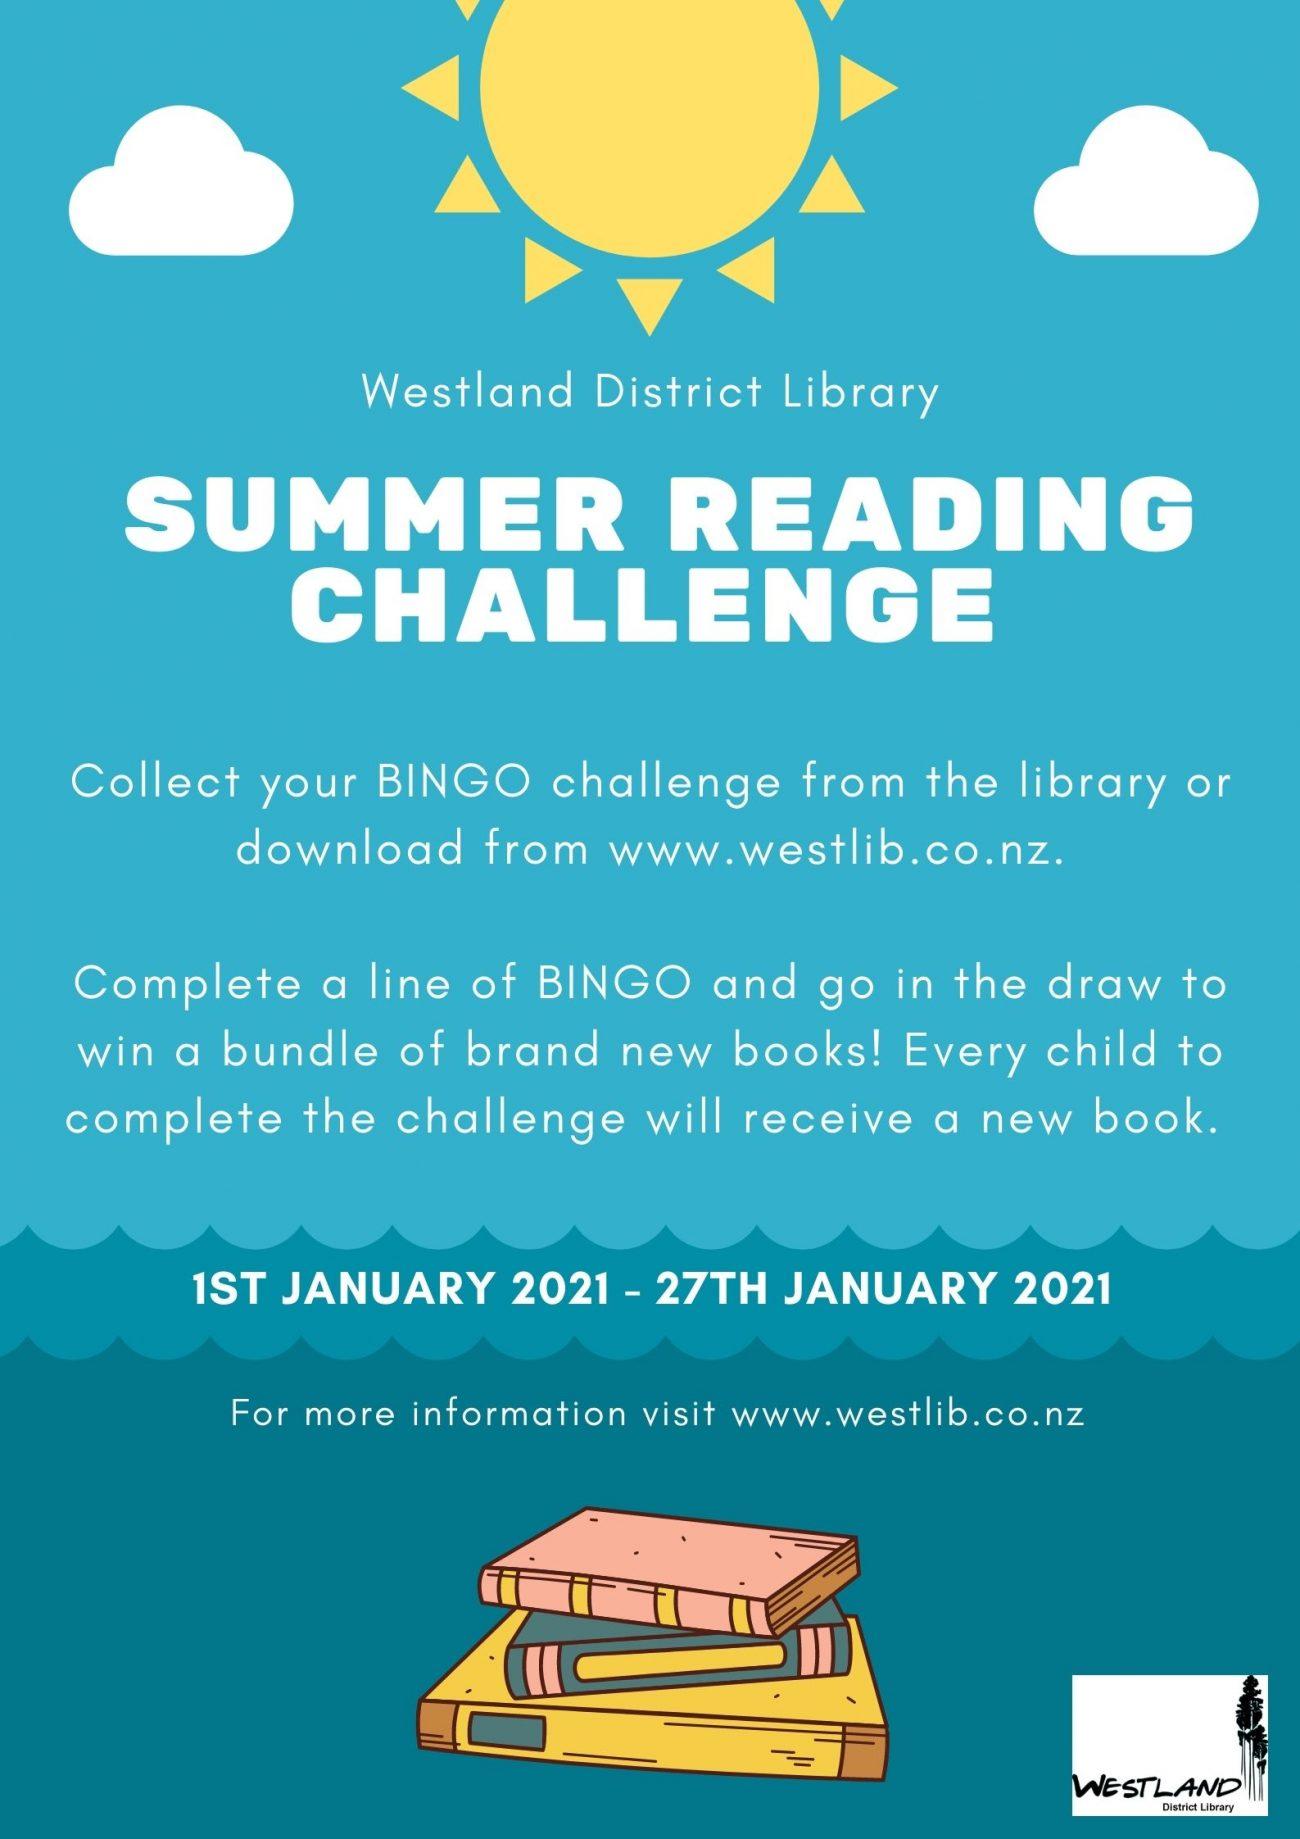 2021 Summer Reading Challenge